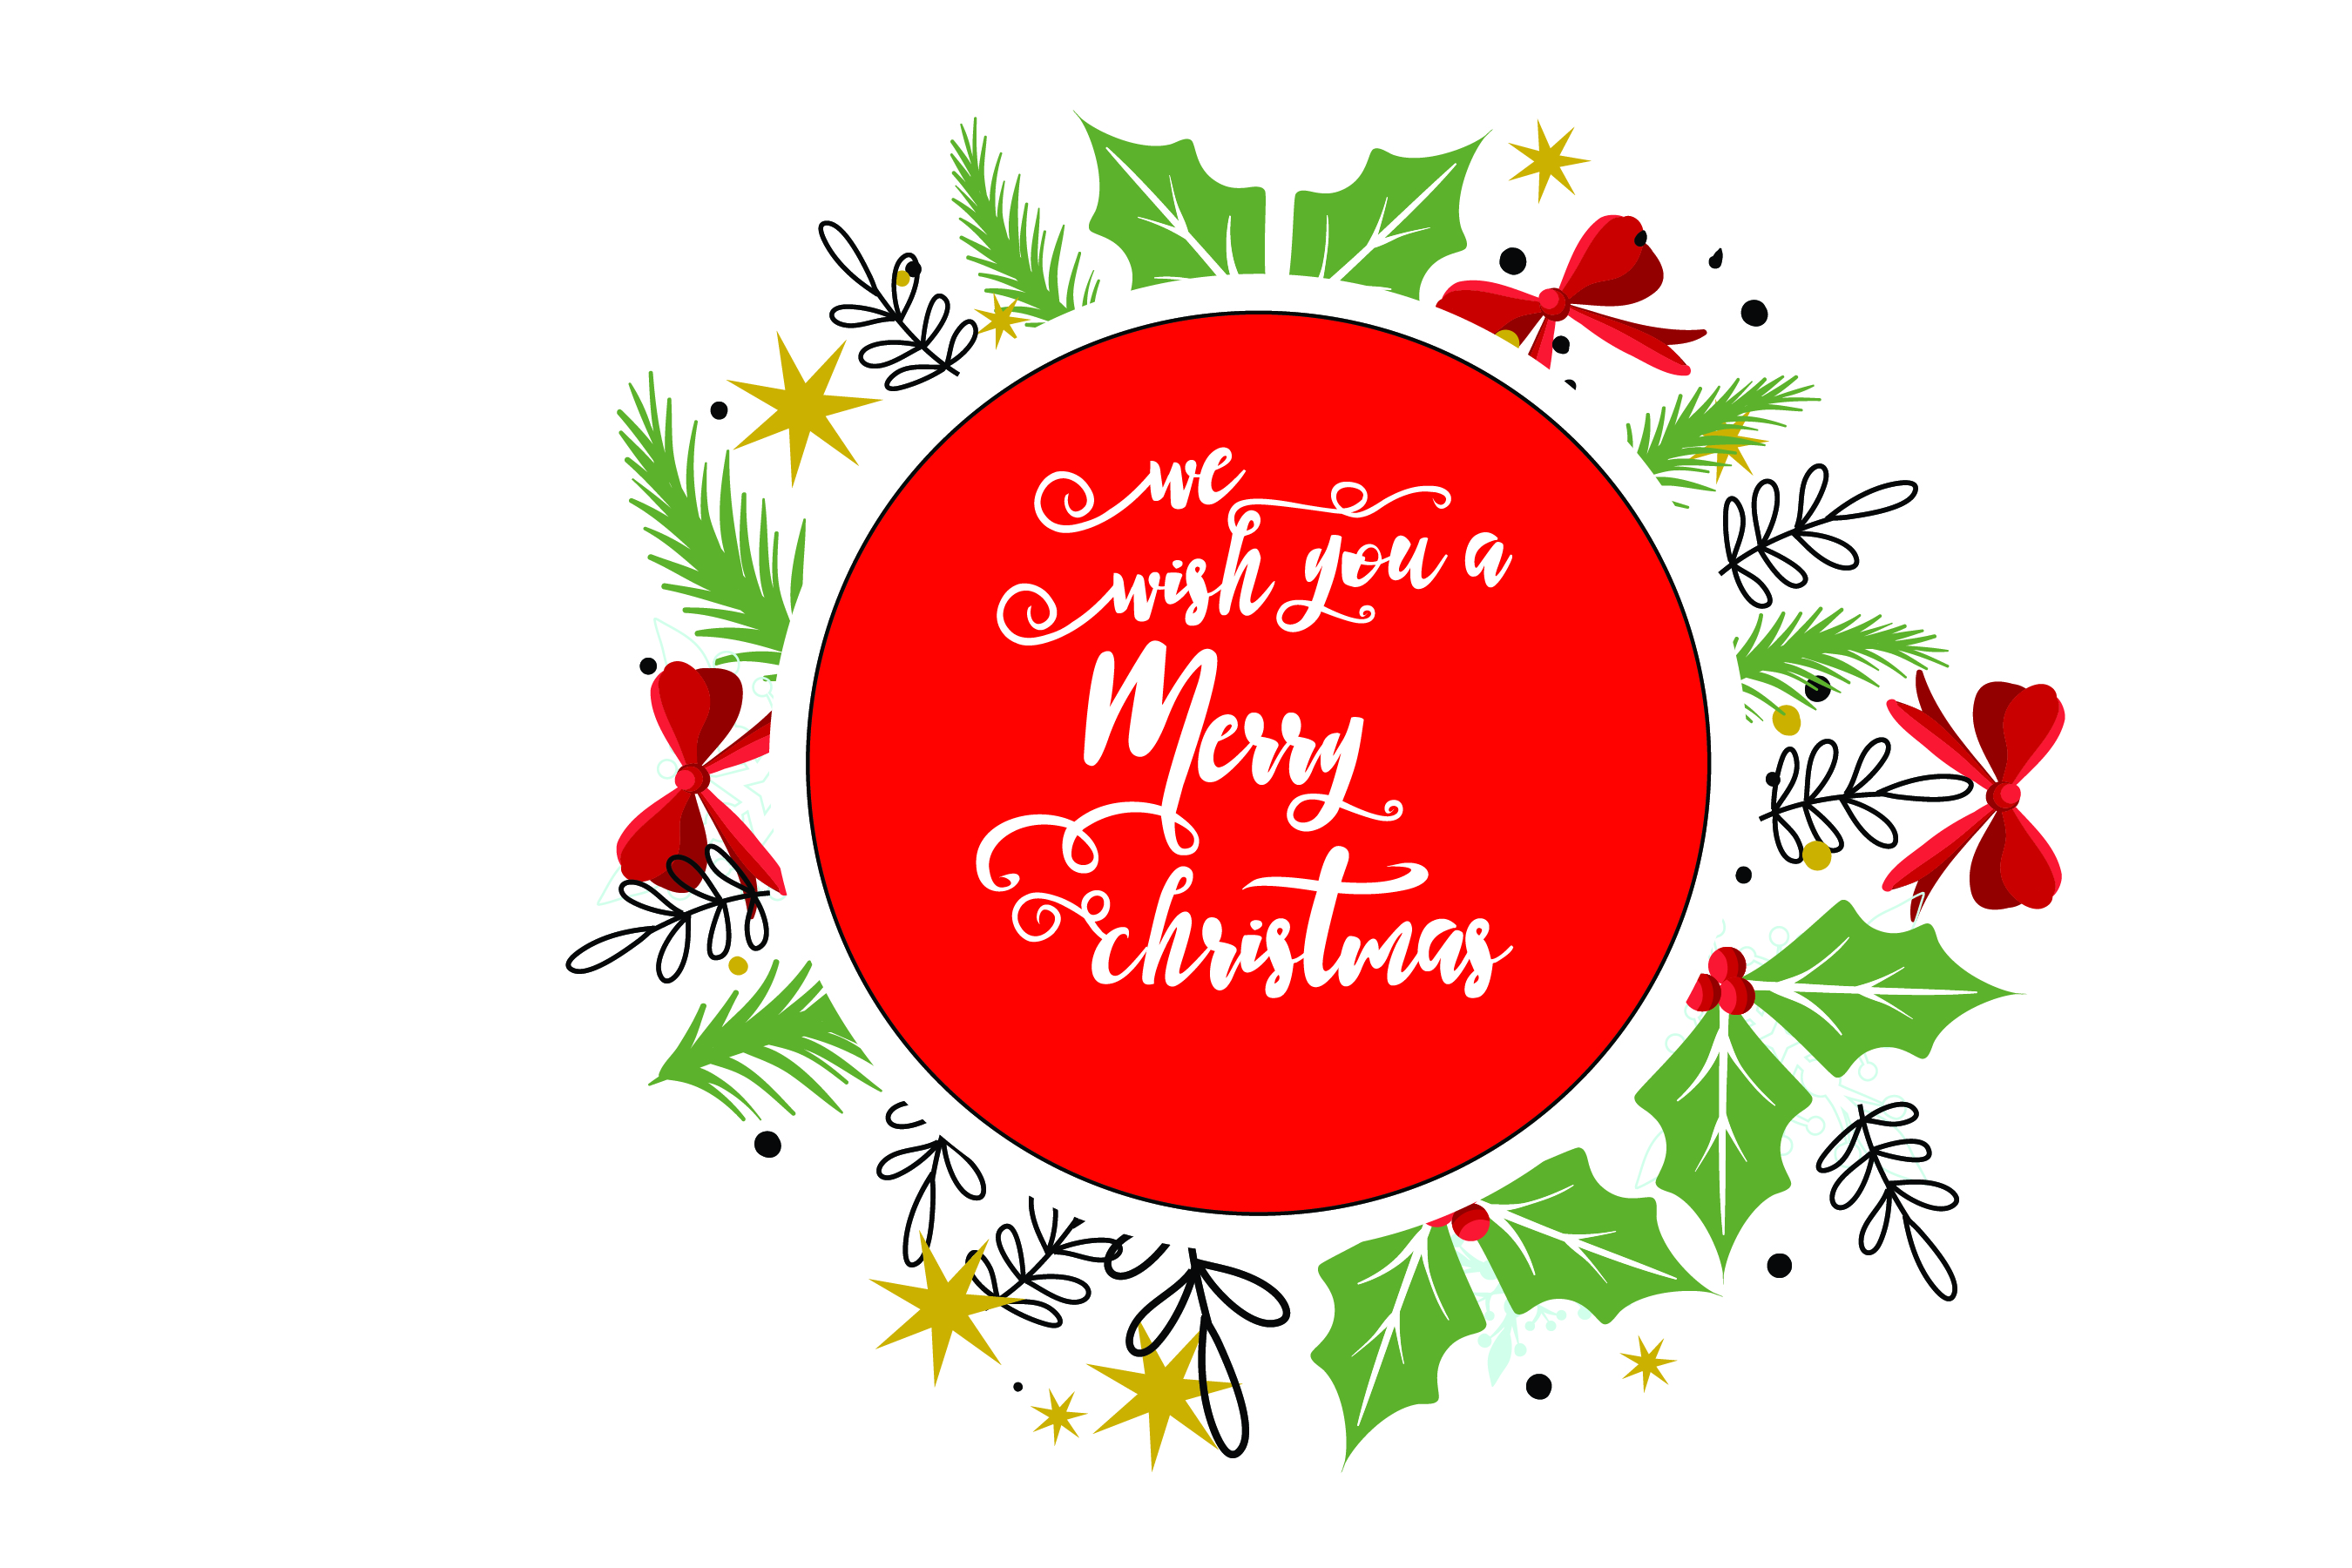 merry christmassvg cut filecoffee mug designgreeting card